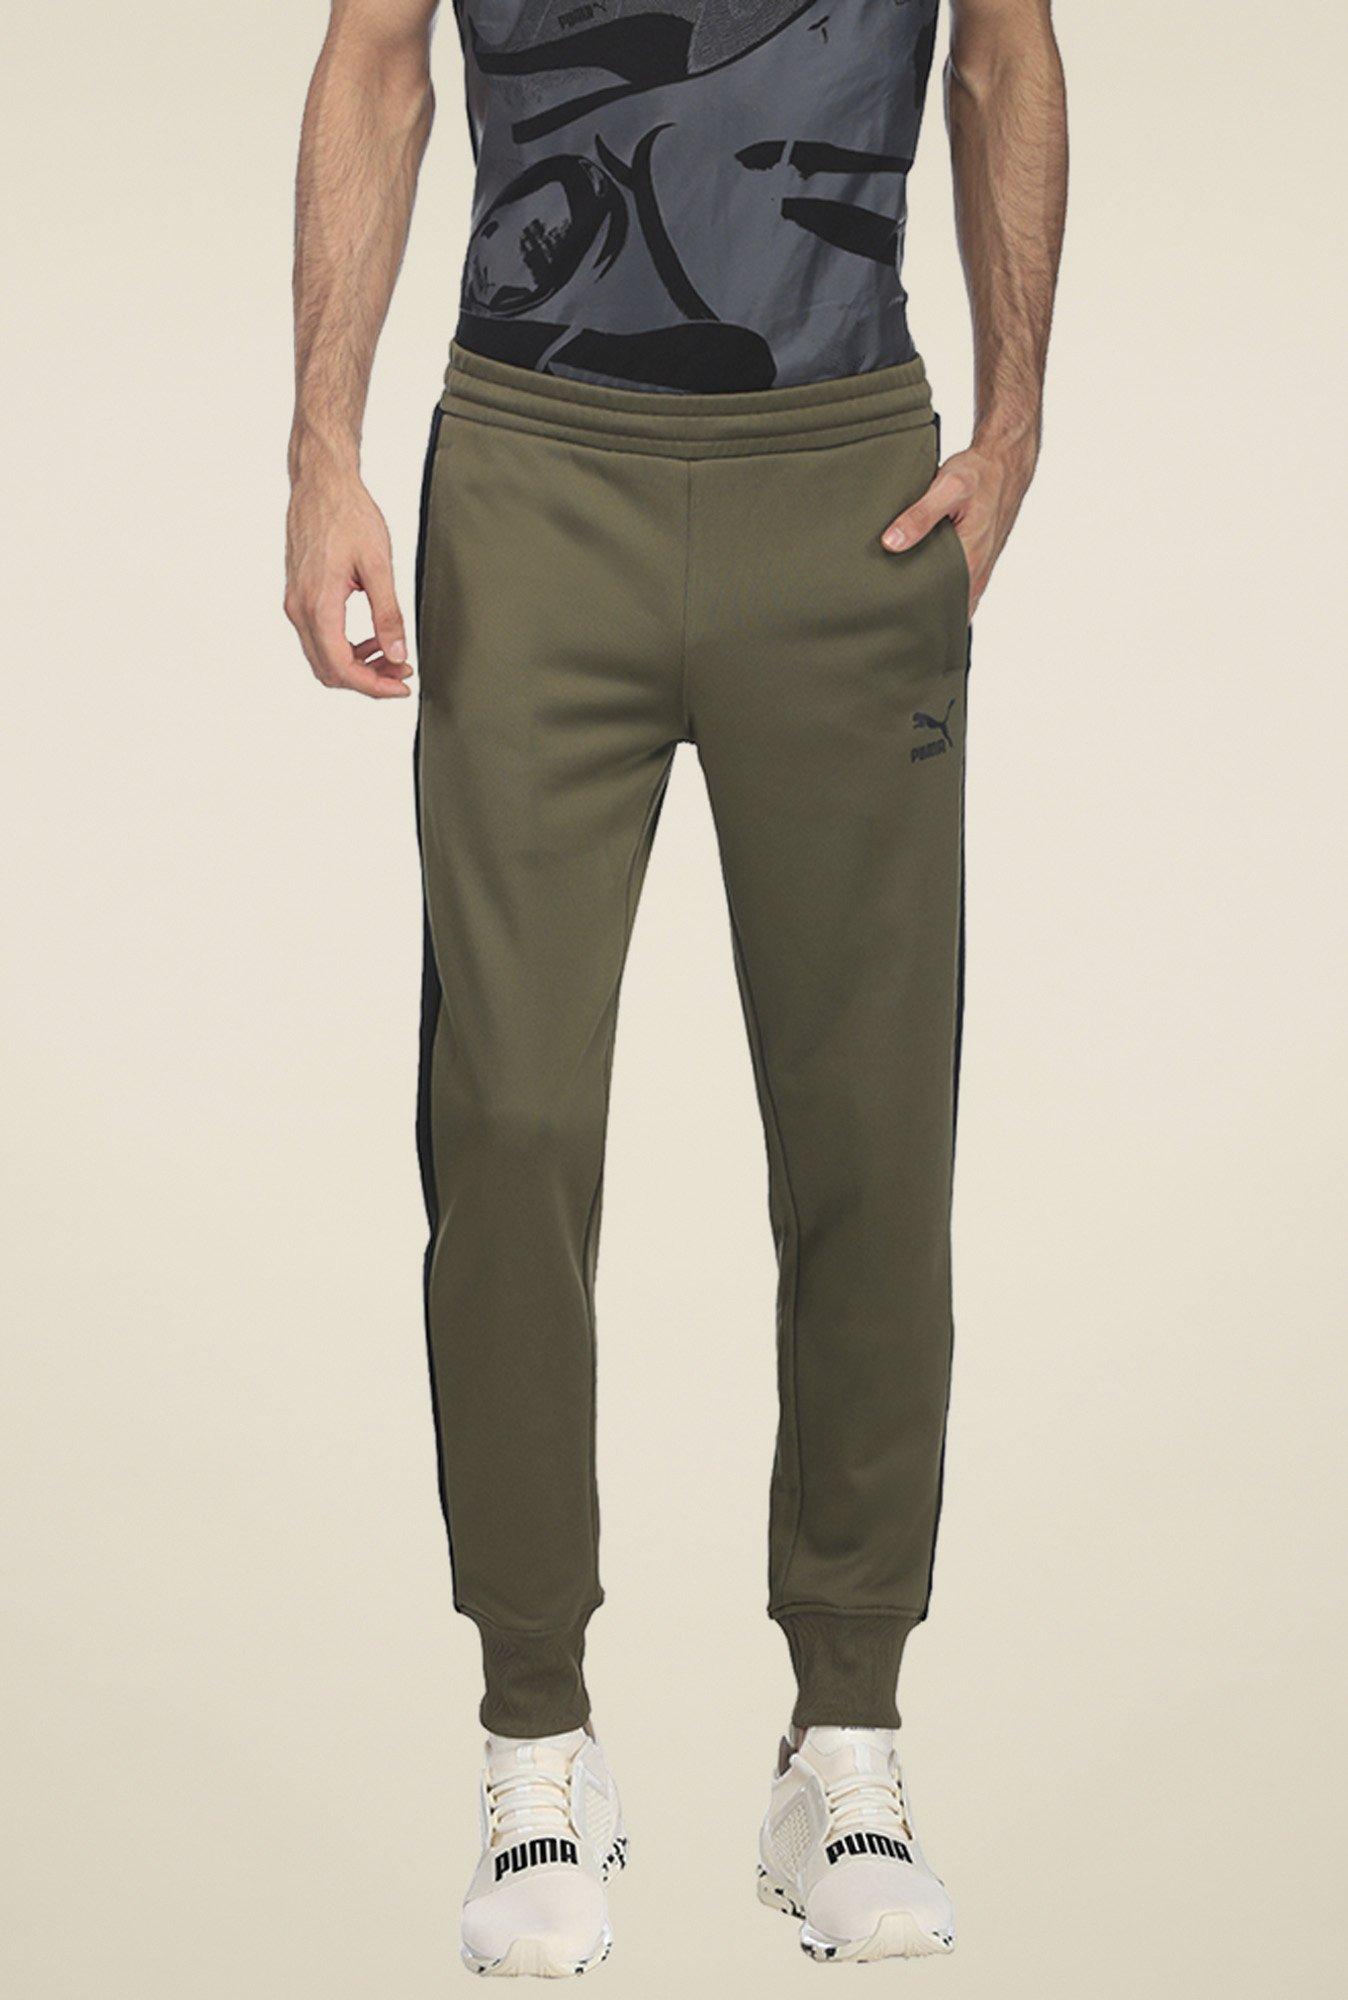 666c4f3f0c Buy Puma Olive Slim Fit Joggers for Men Online @ Tata CLiQ